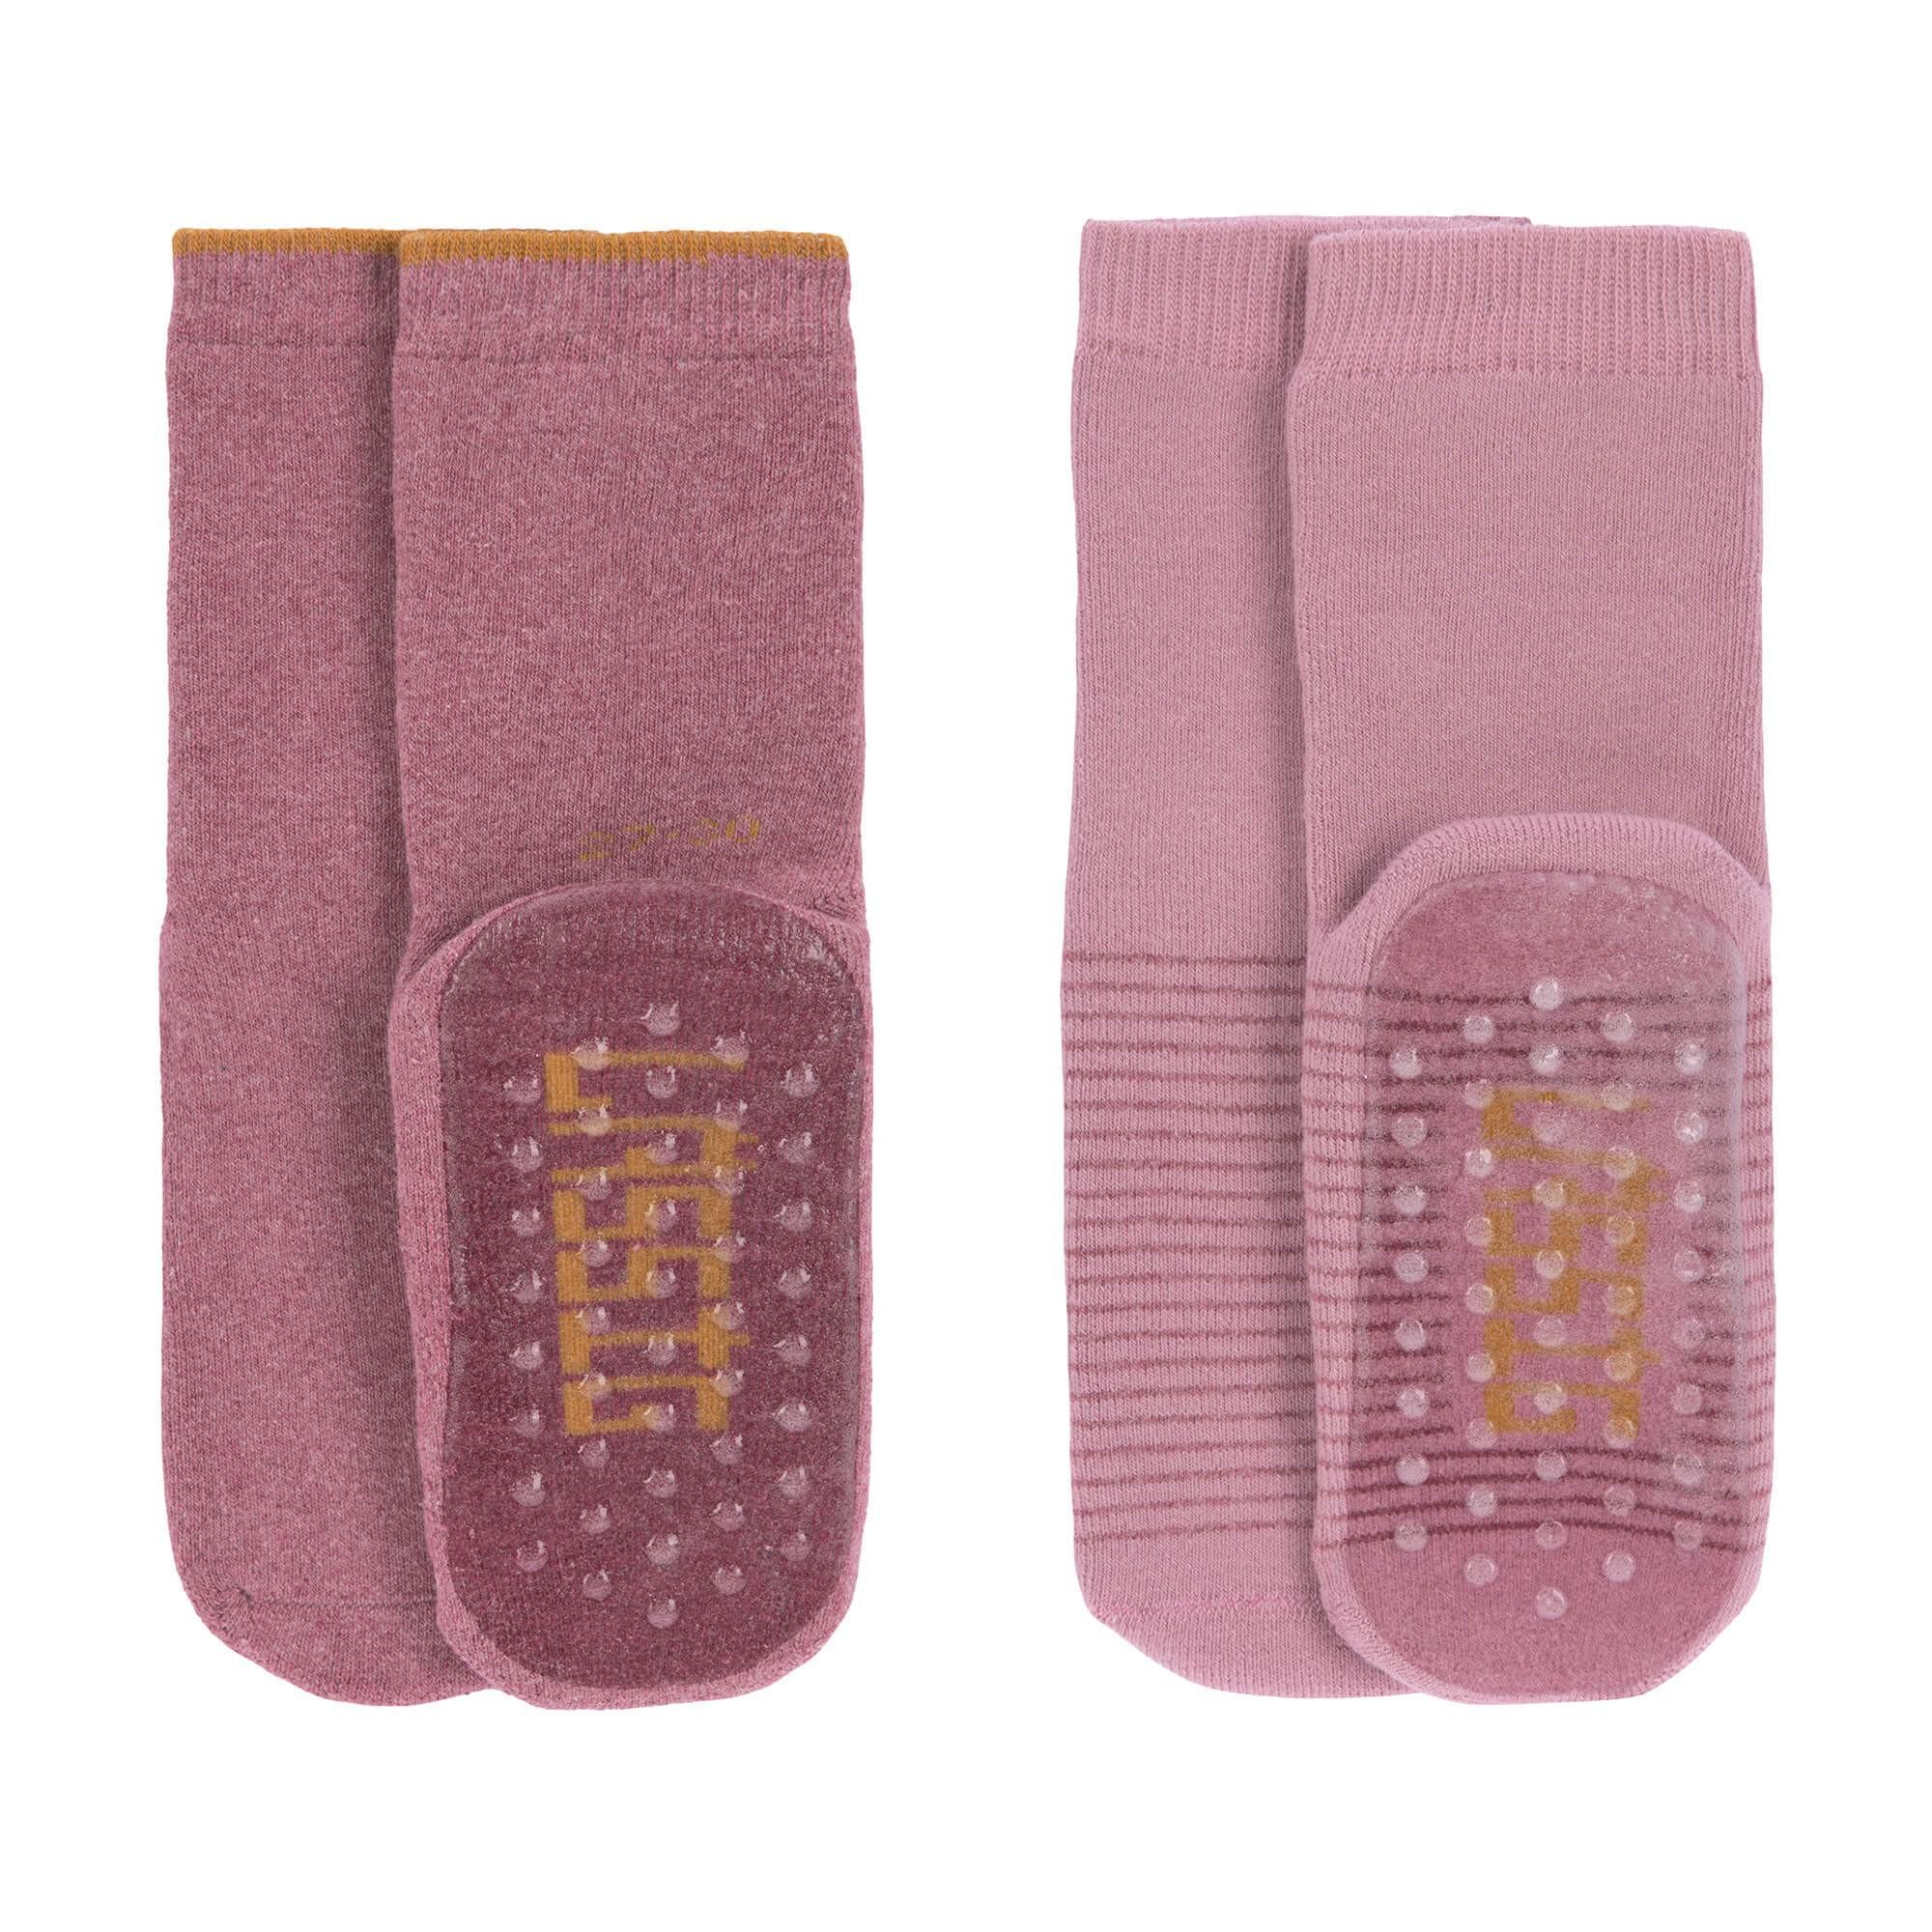 Lassig - Anti-slip Socks 2 pcs. assorted rosewood/rose, Size: 23-26